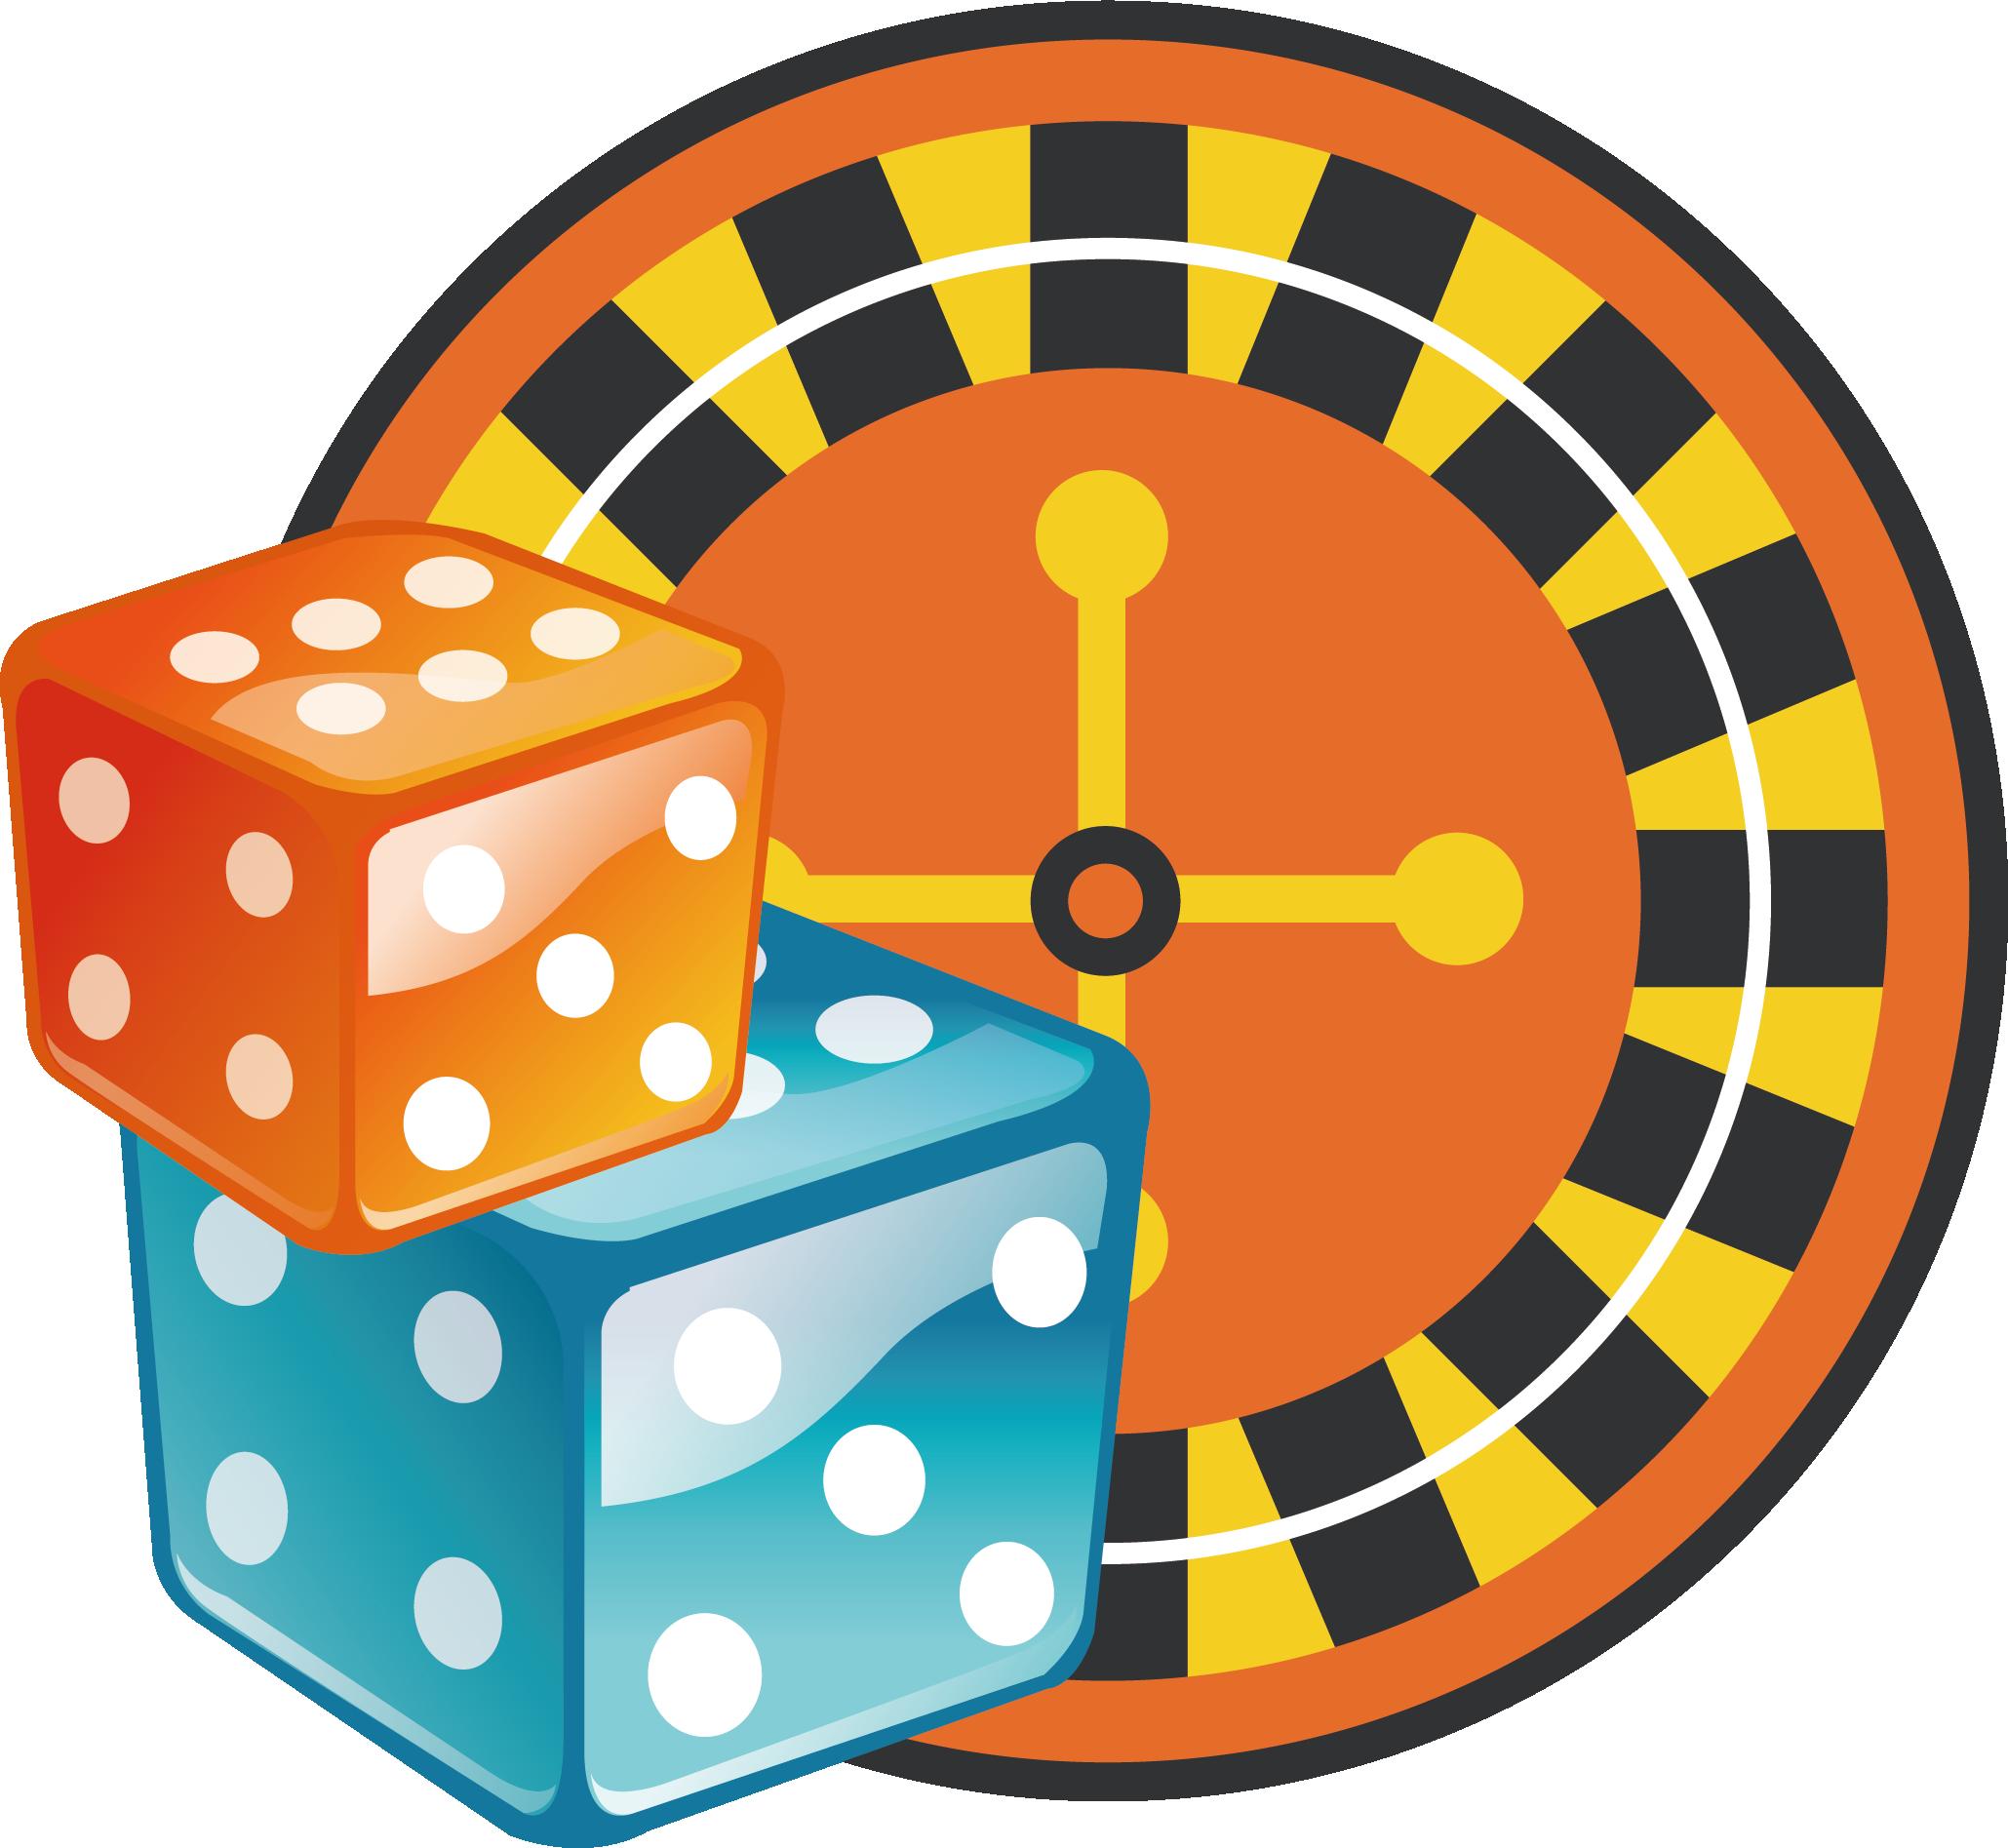 Dice clipart gamble. Roulette casino gambling icon